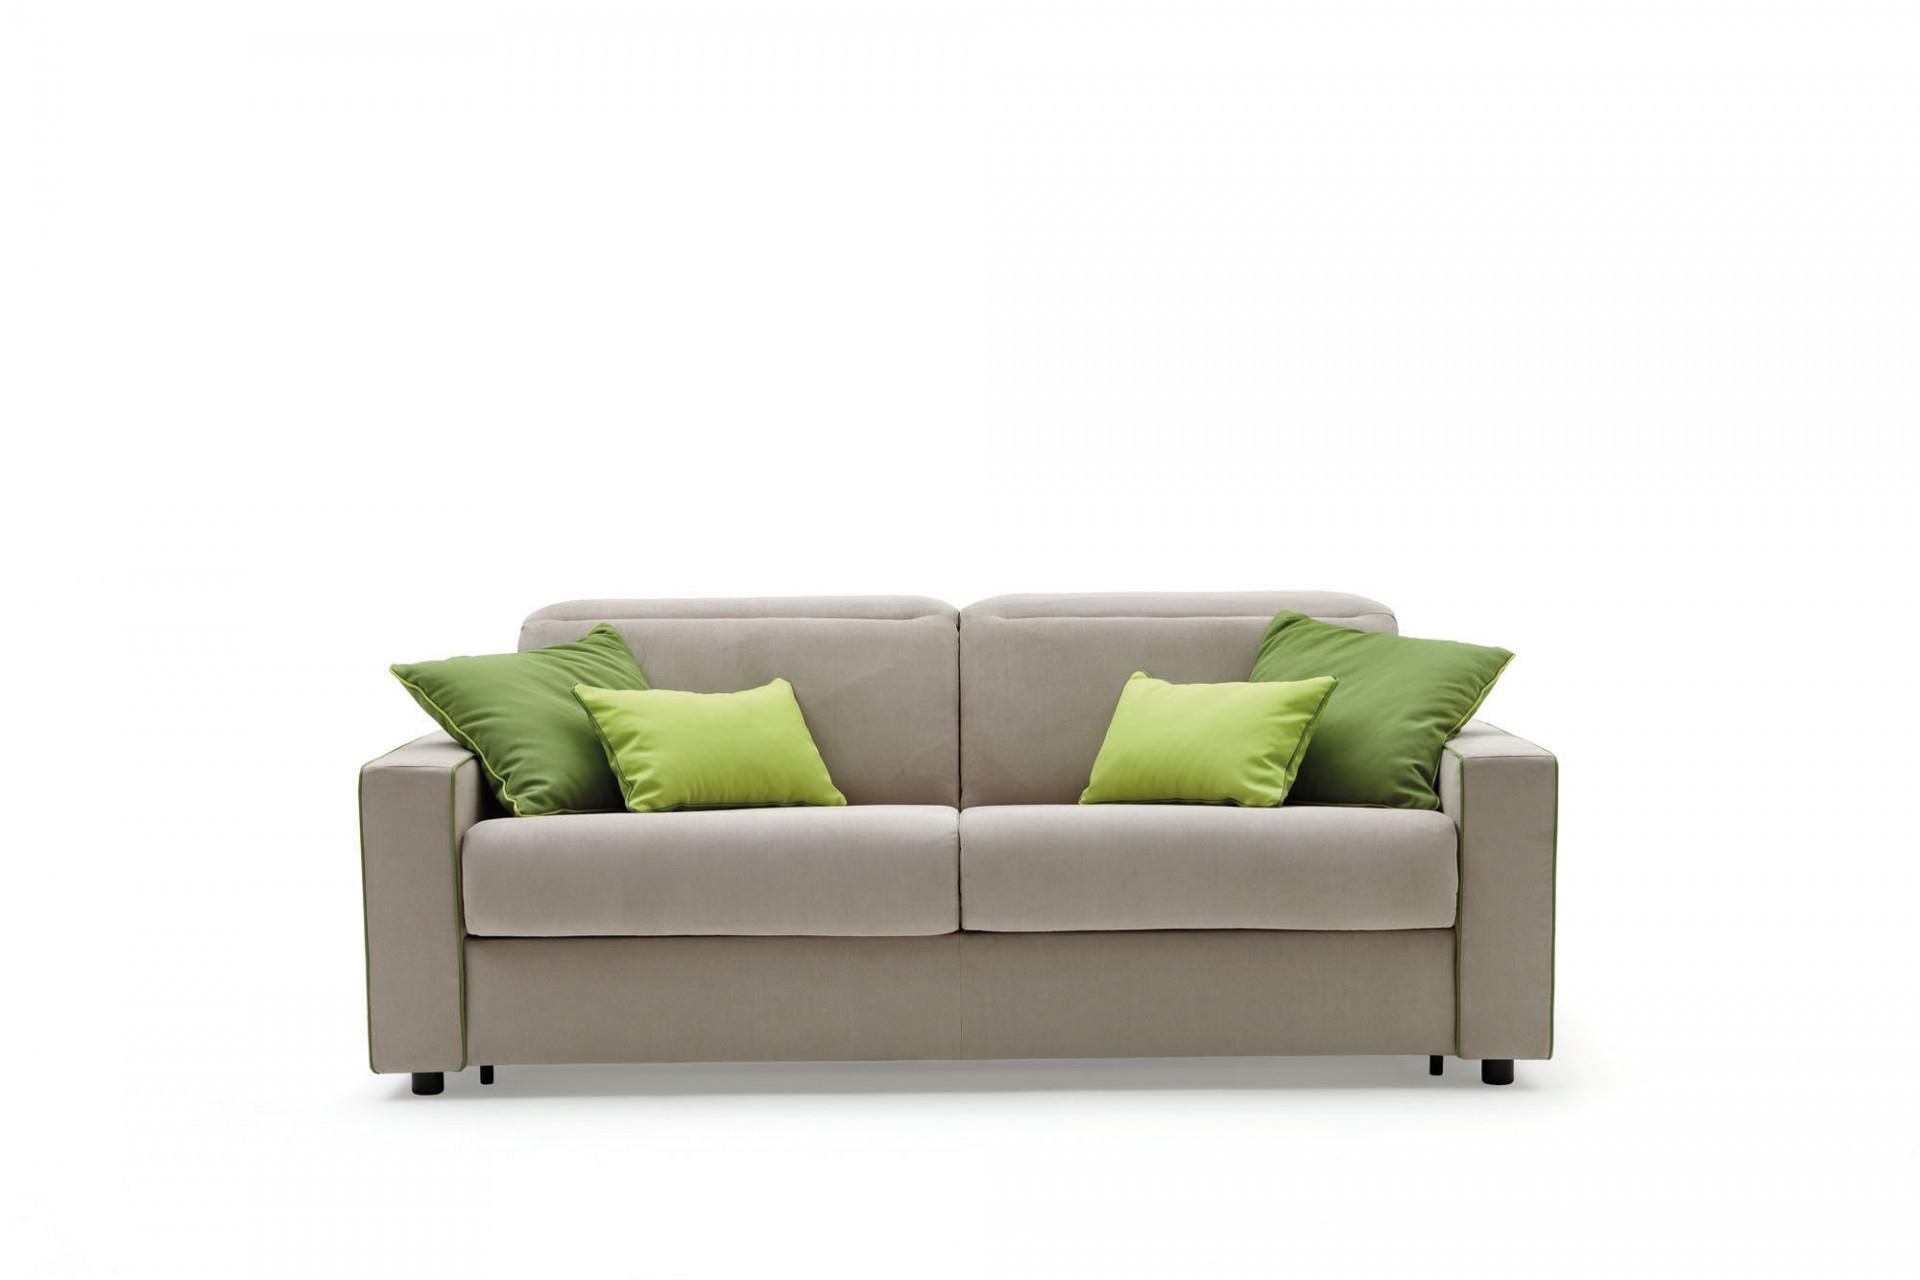 Canapea extensibila 3 locuri, tapitata cu stofa, Barbados l202xA102xH87 cm